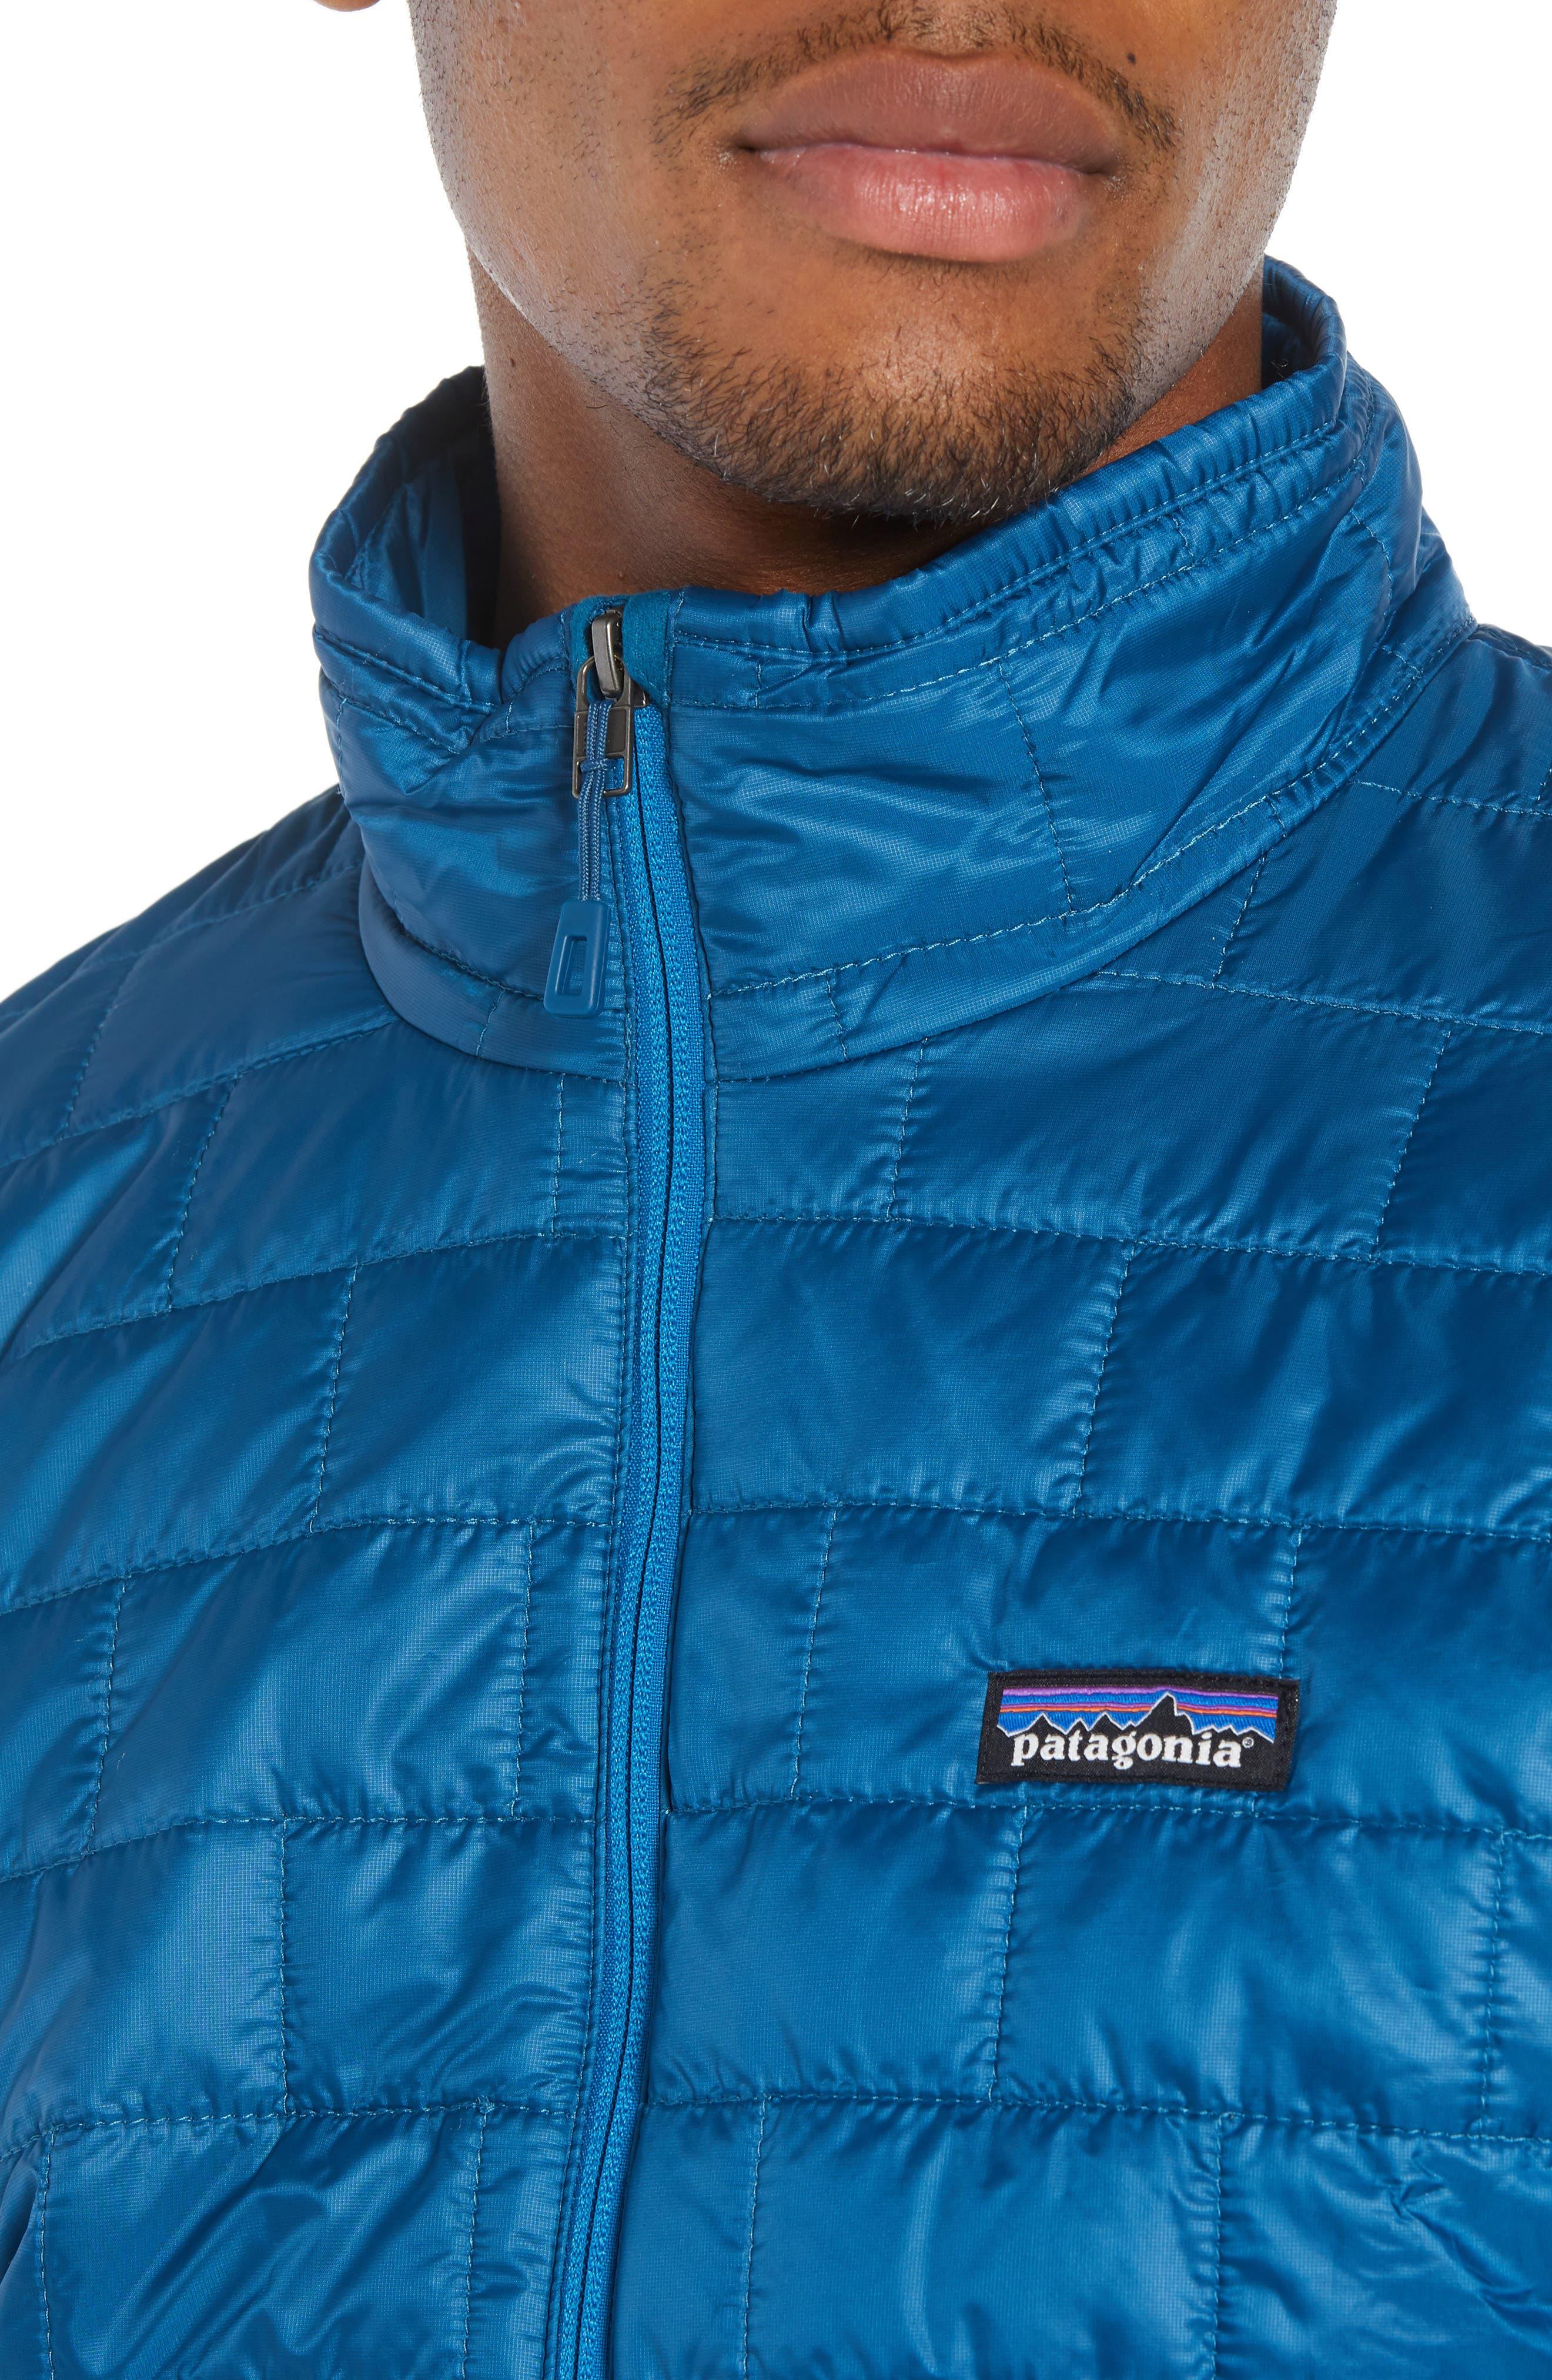 PATAGONIA, 'Nano Puff<sup>®</sup>' Water Resistant Jacket, Alternate thumbnail 5, color, BIG SUR BLUE W/ BALKAN BLUE